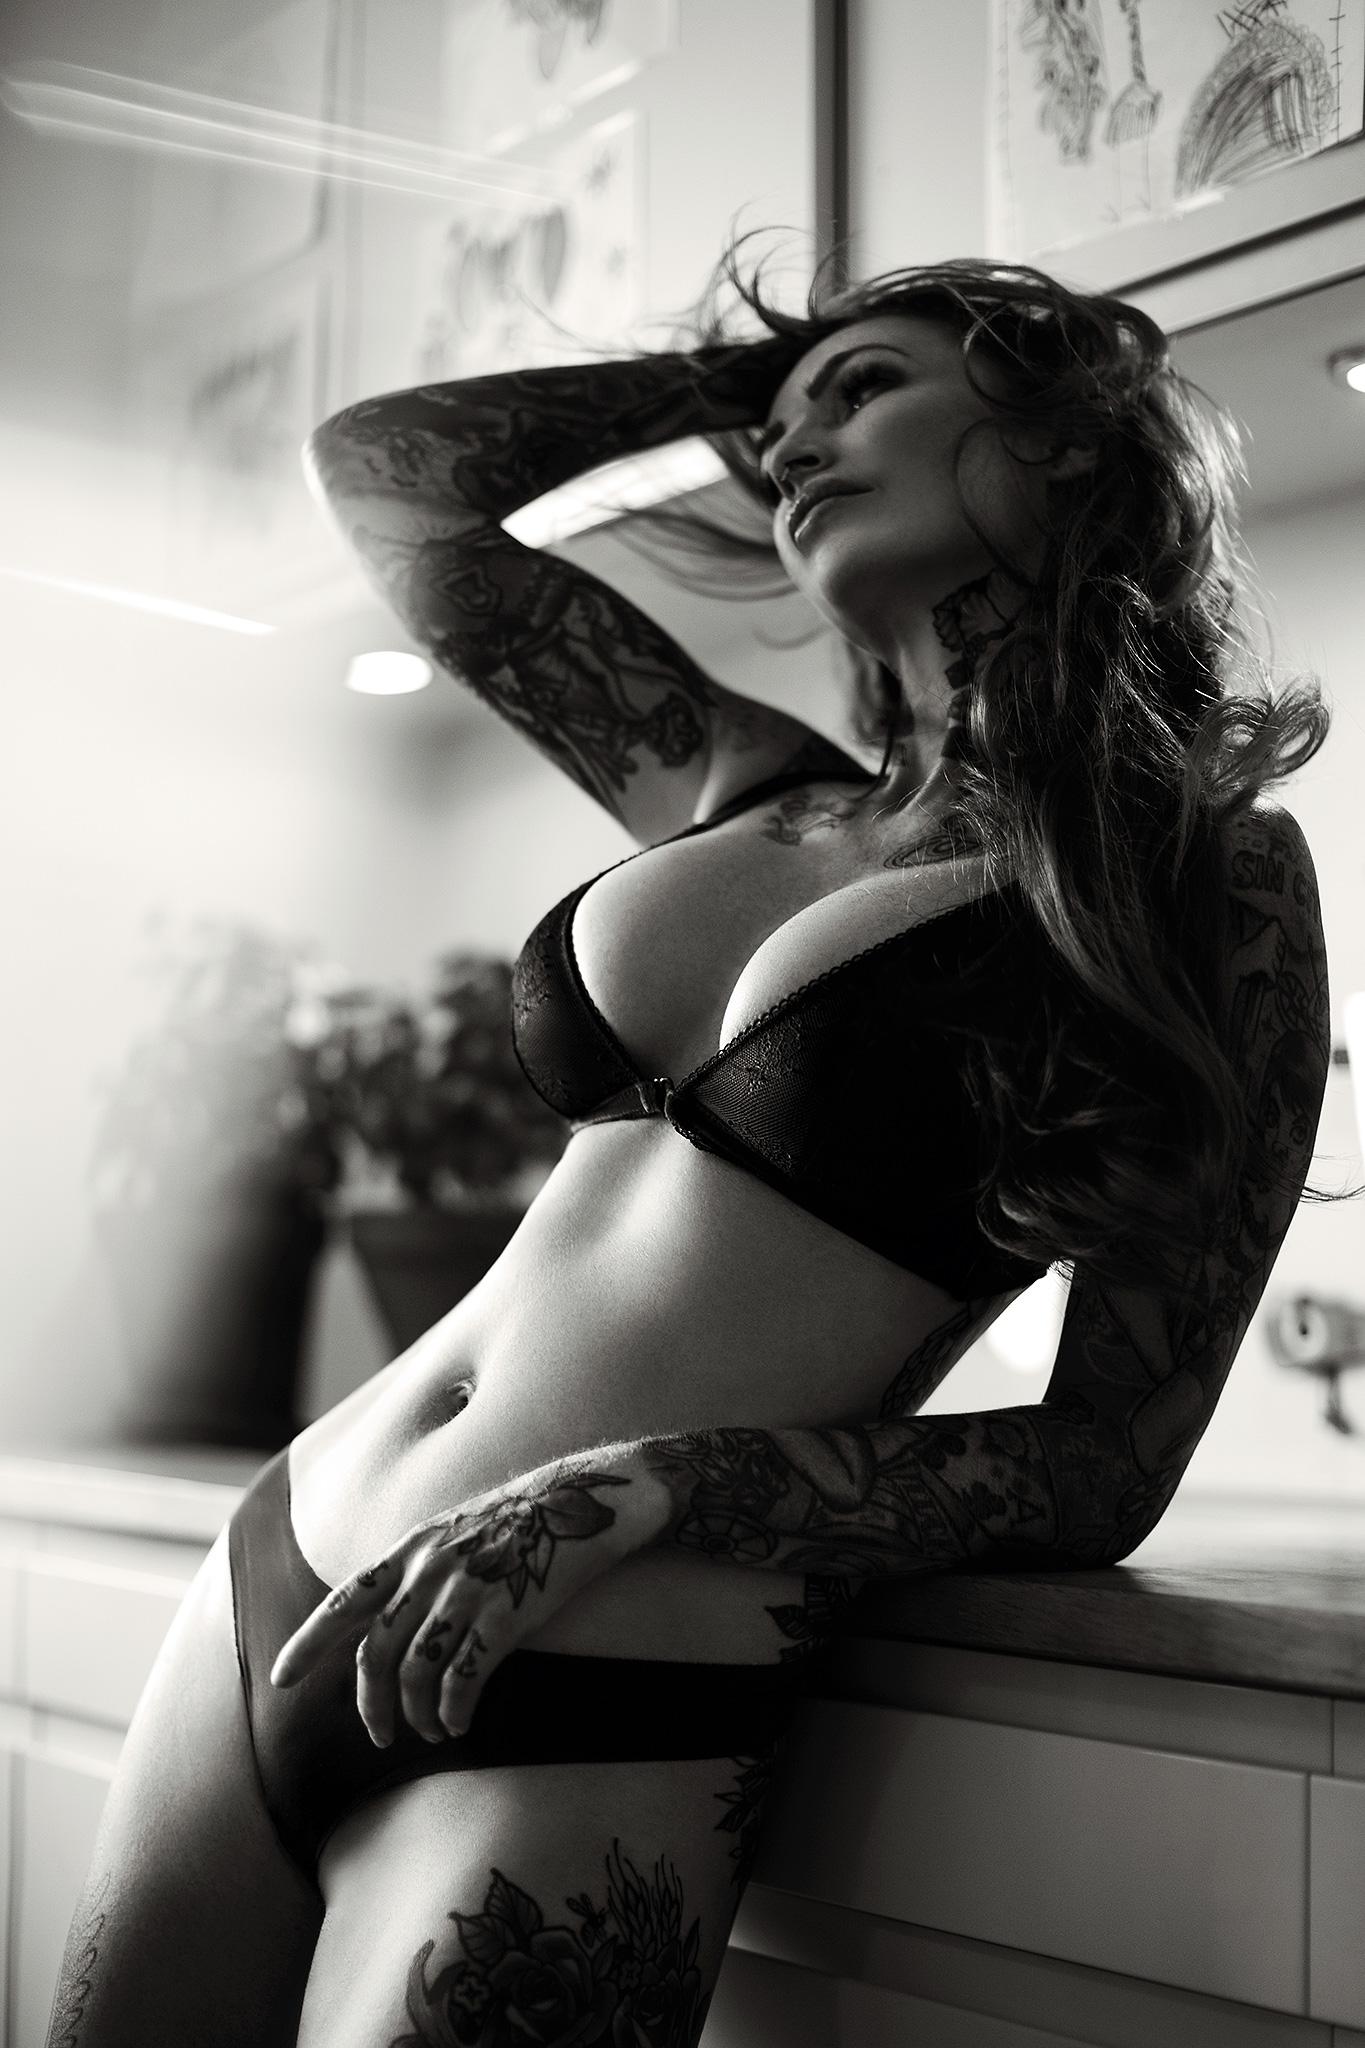 Mikkel_Laumann_Photography_Anne_Lindfjeld_Reroute_To_Remain_Photoshoot_Magazine_06.jpg